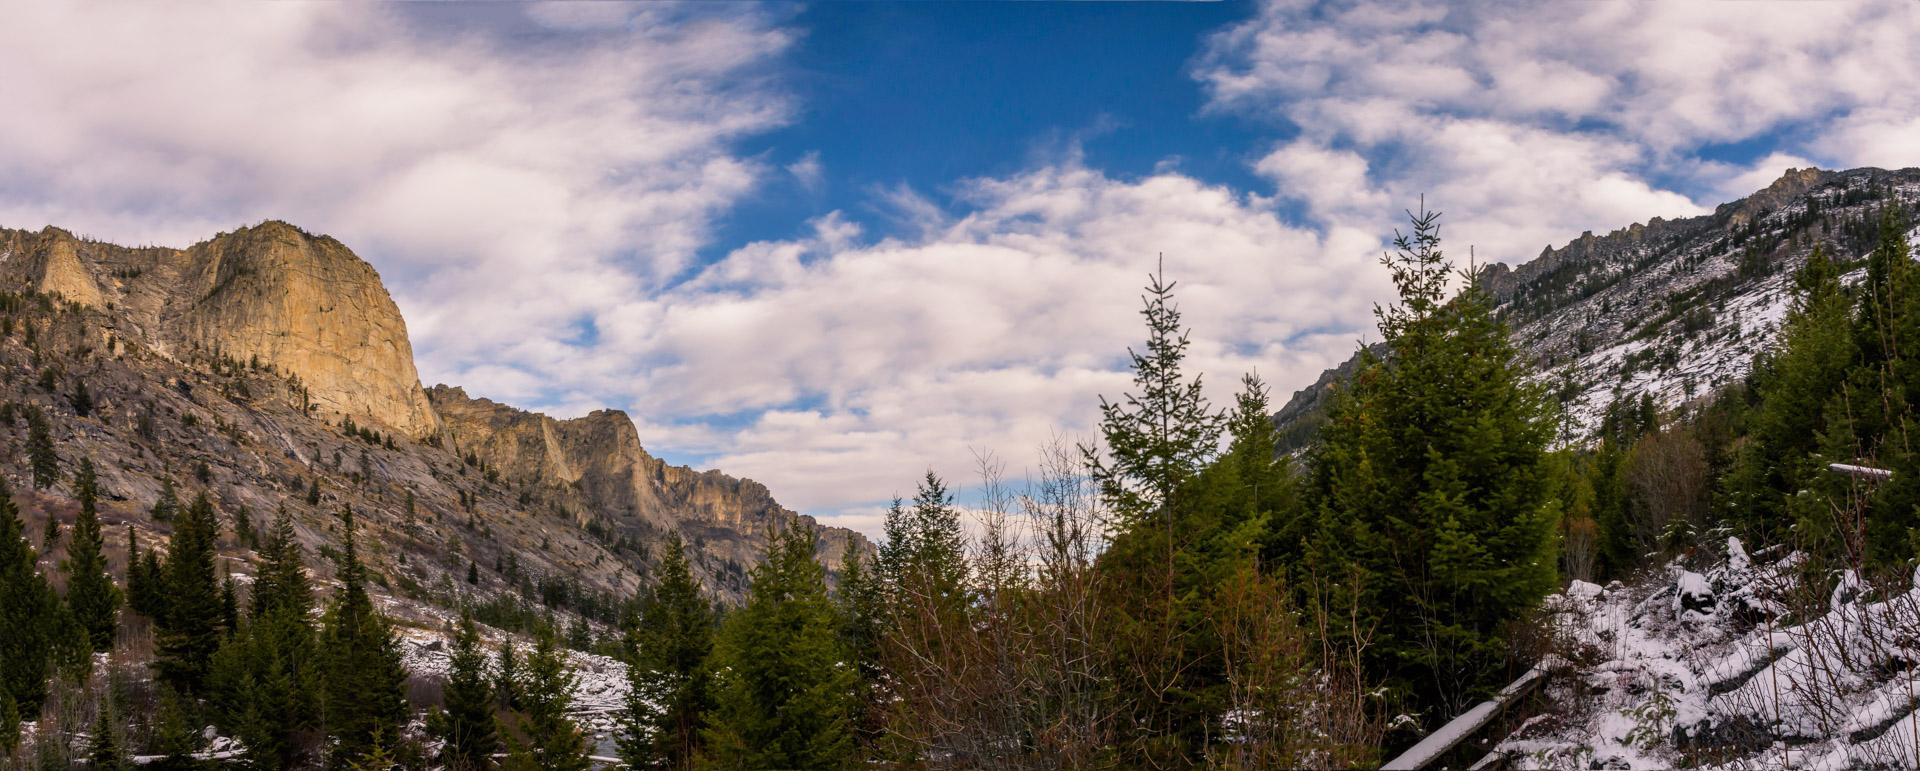 The Waterfalls Of Blodgett Canyon Radleyice